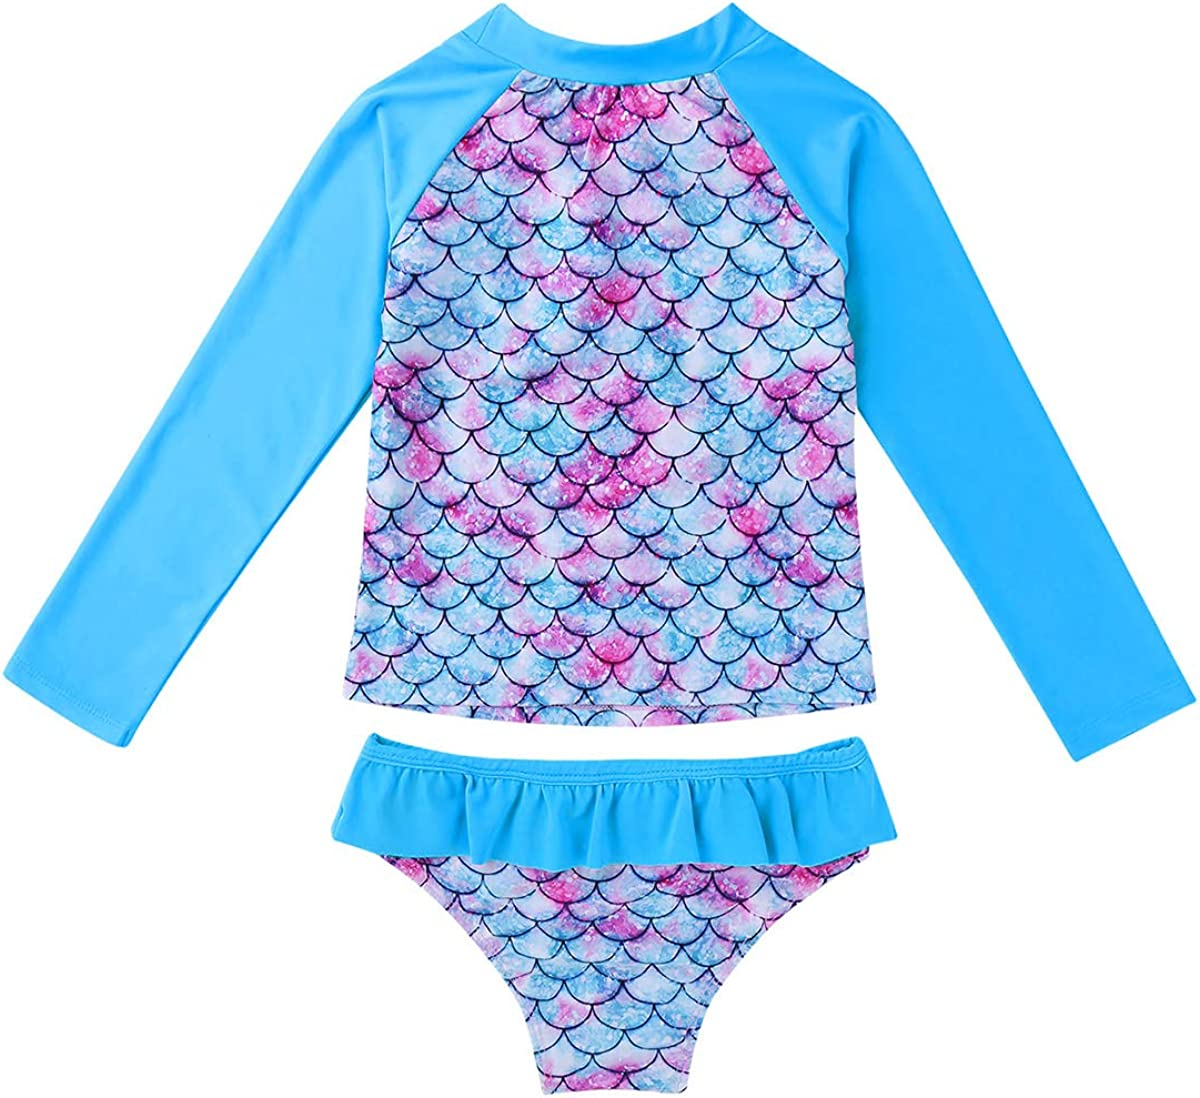 Aislor Kids Baby Girls Mermaid Bikini Set Fish Scales Printed Swimwear Long Sleeves Tankini Tops with Bottoms